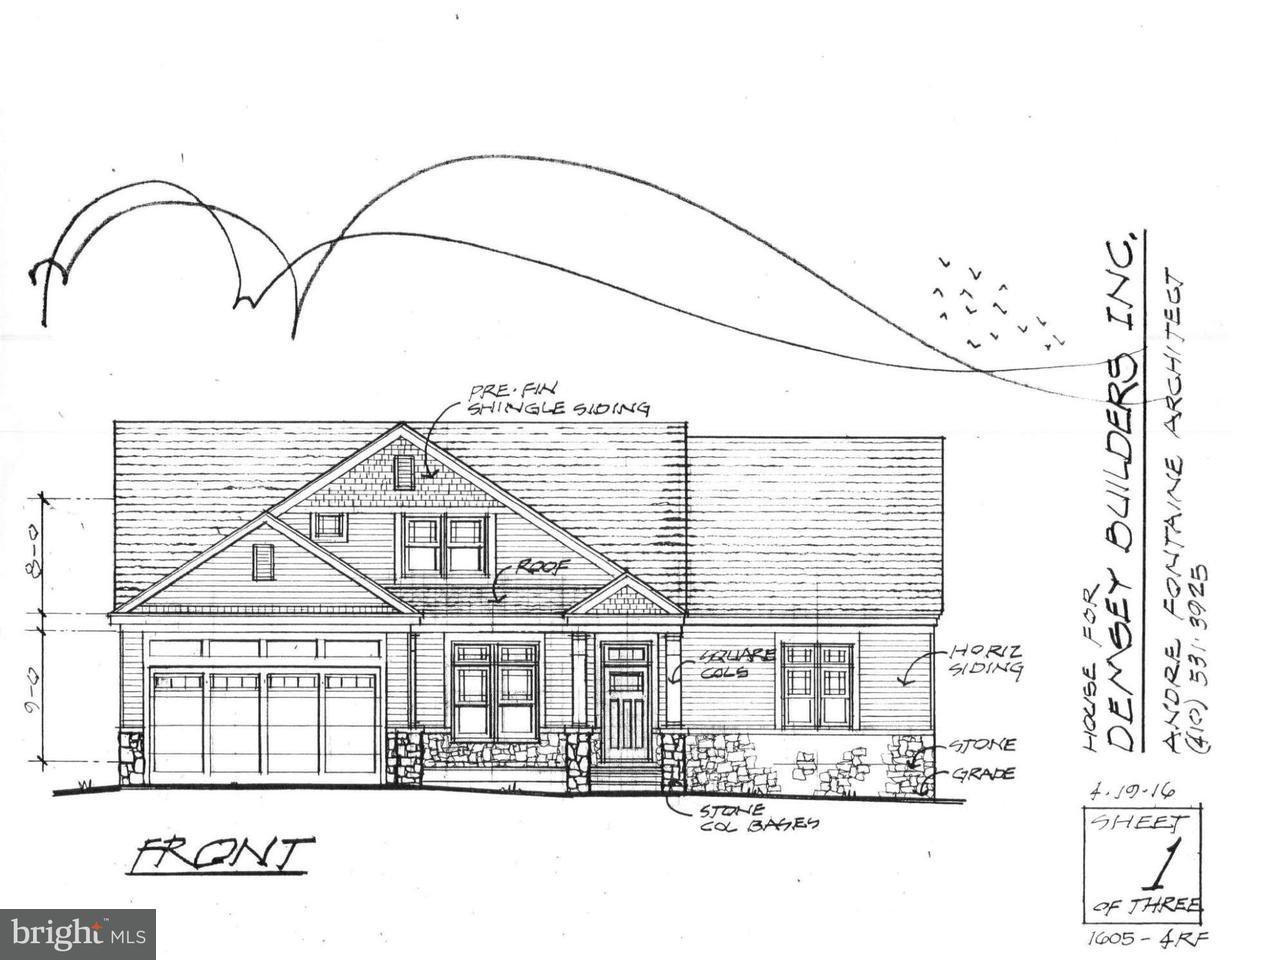 Single Family Home for Sale at 3089 Newington Drive 3089 Newington Drive Riva, Maryland 21140 United States